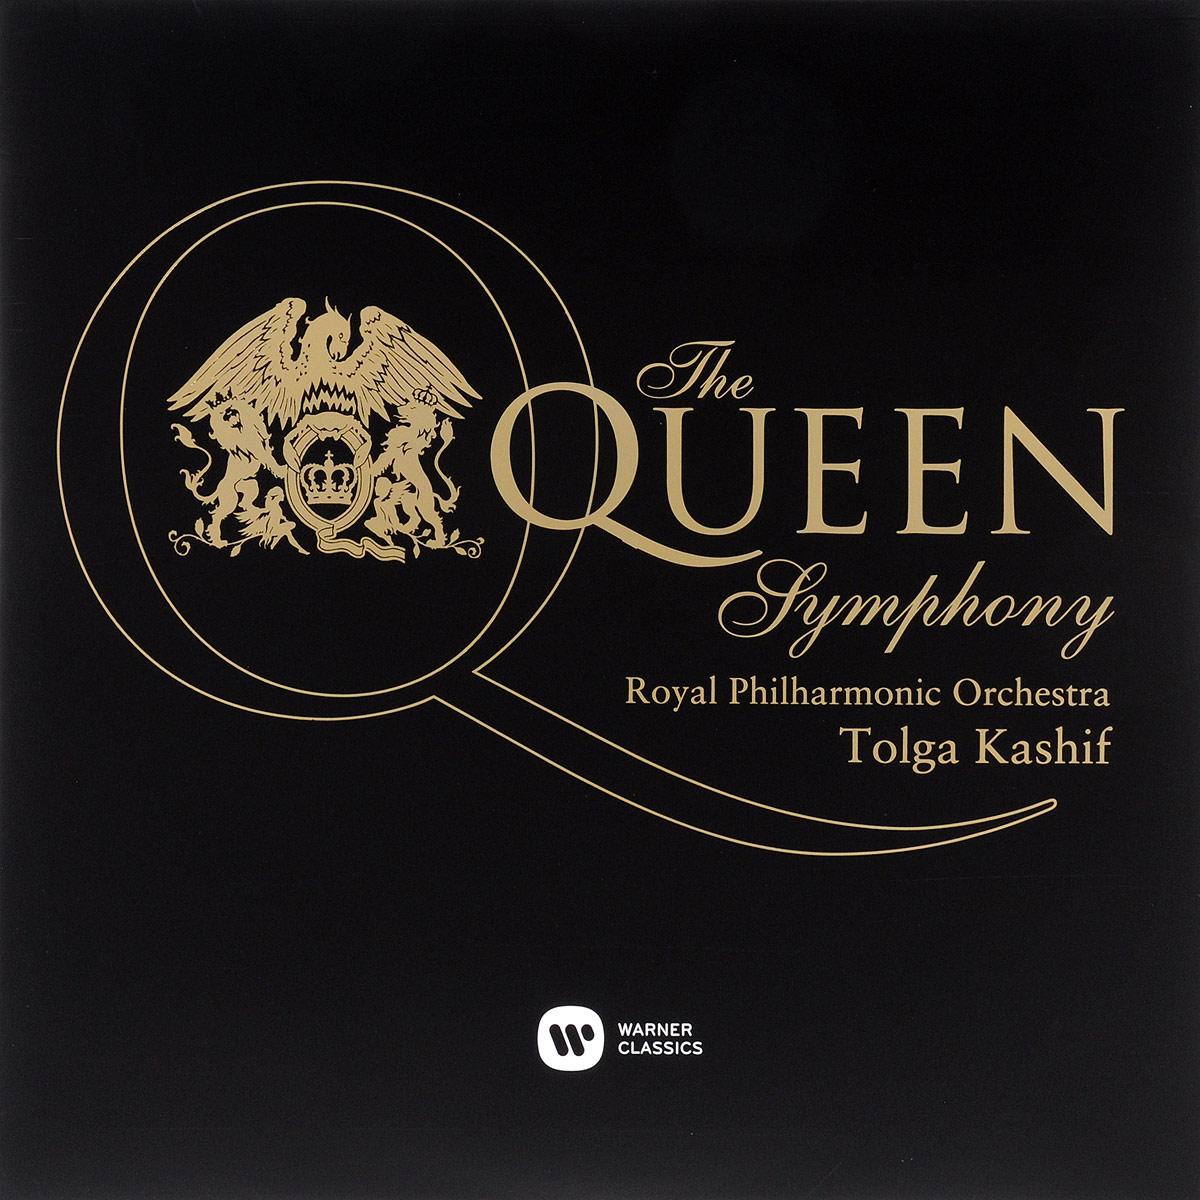 все цены на Толга Кашиф,The Royal Philharmonic Orchestra Tolga Kashif, Royal Philharmonic Orchestra. The Queen Symphony (2 LP) онлайн